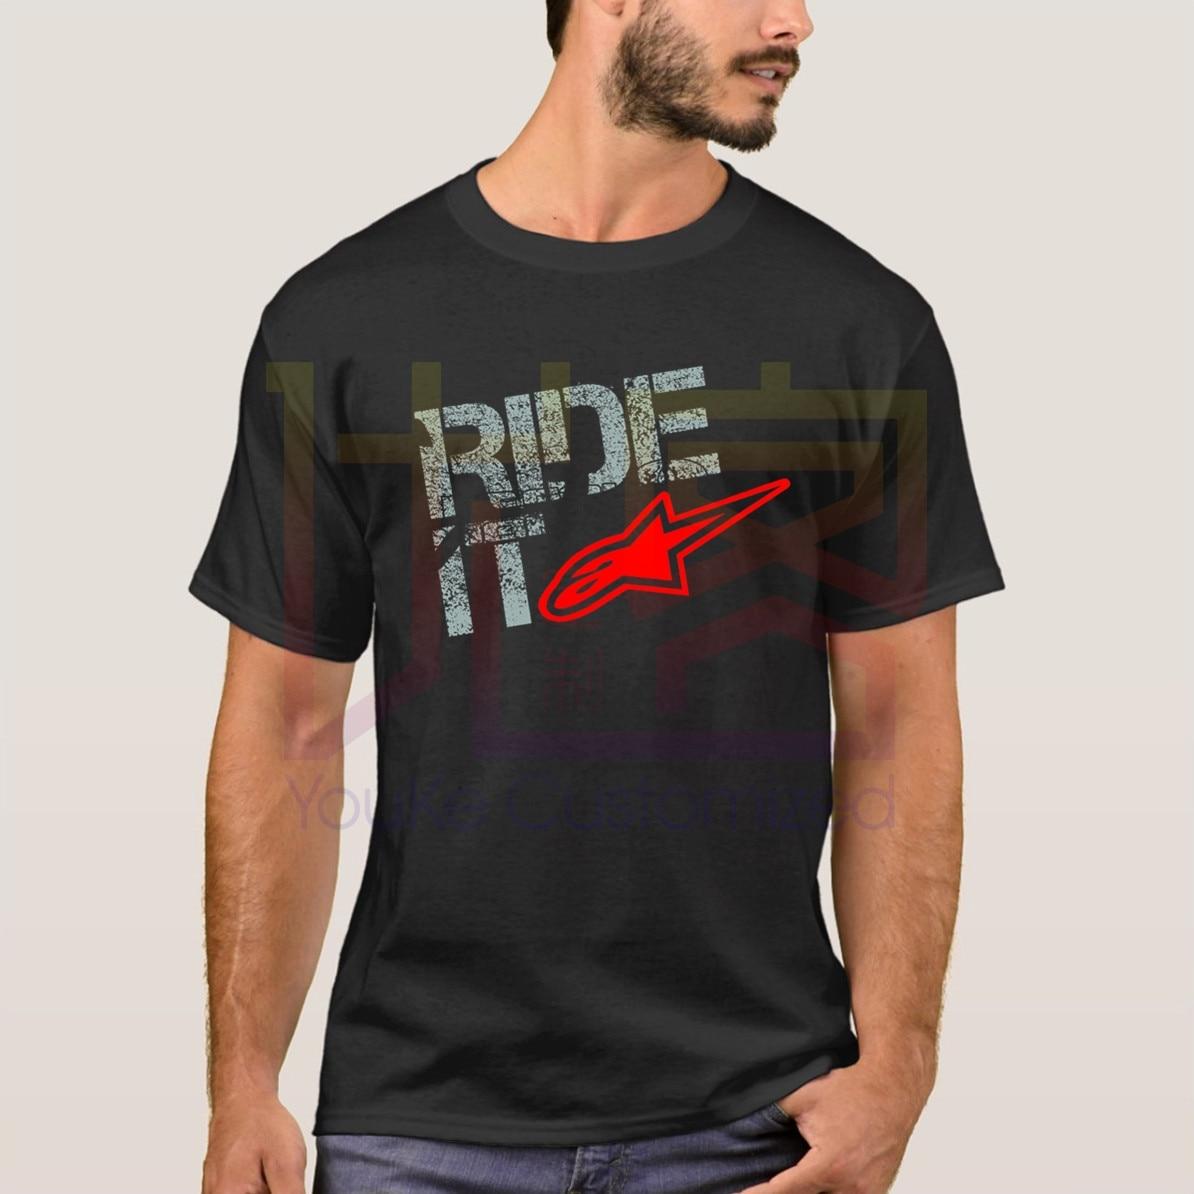 Alpine estrella montar extrema Atv suciedad Bikeer Quads T camisa Casual orgullo T camisa de los hombres Unisex nueva moda camiseta